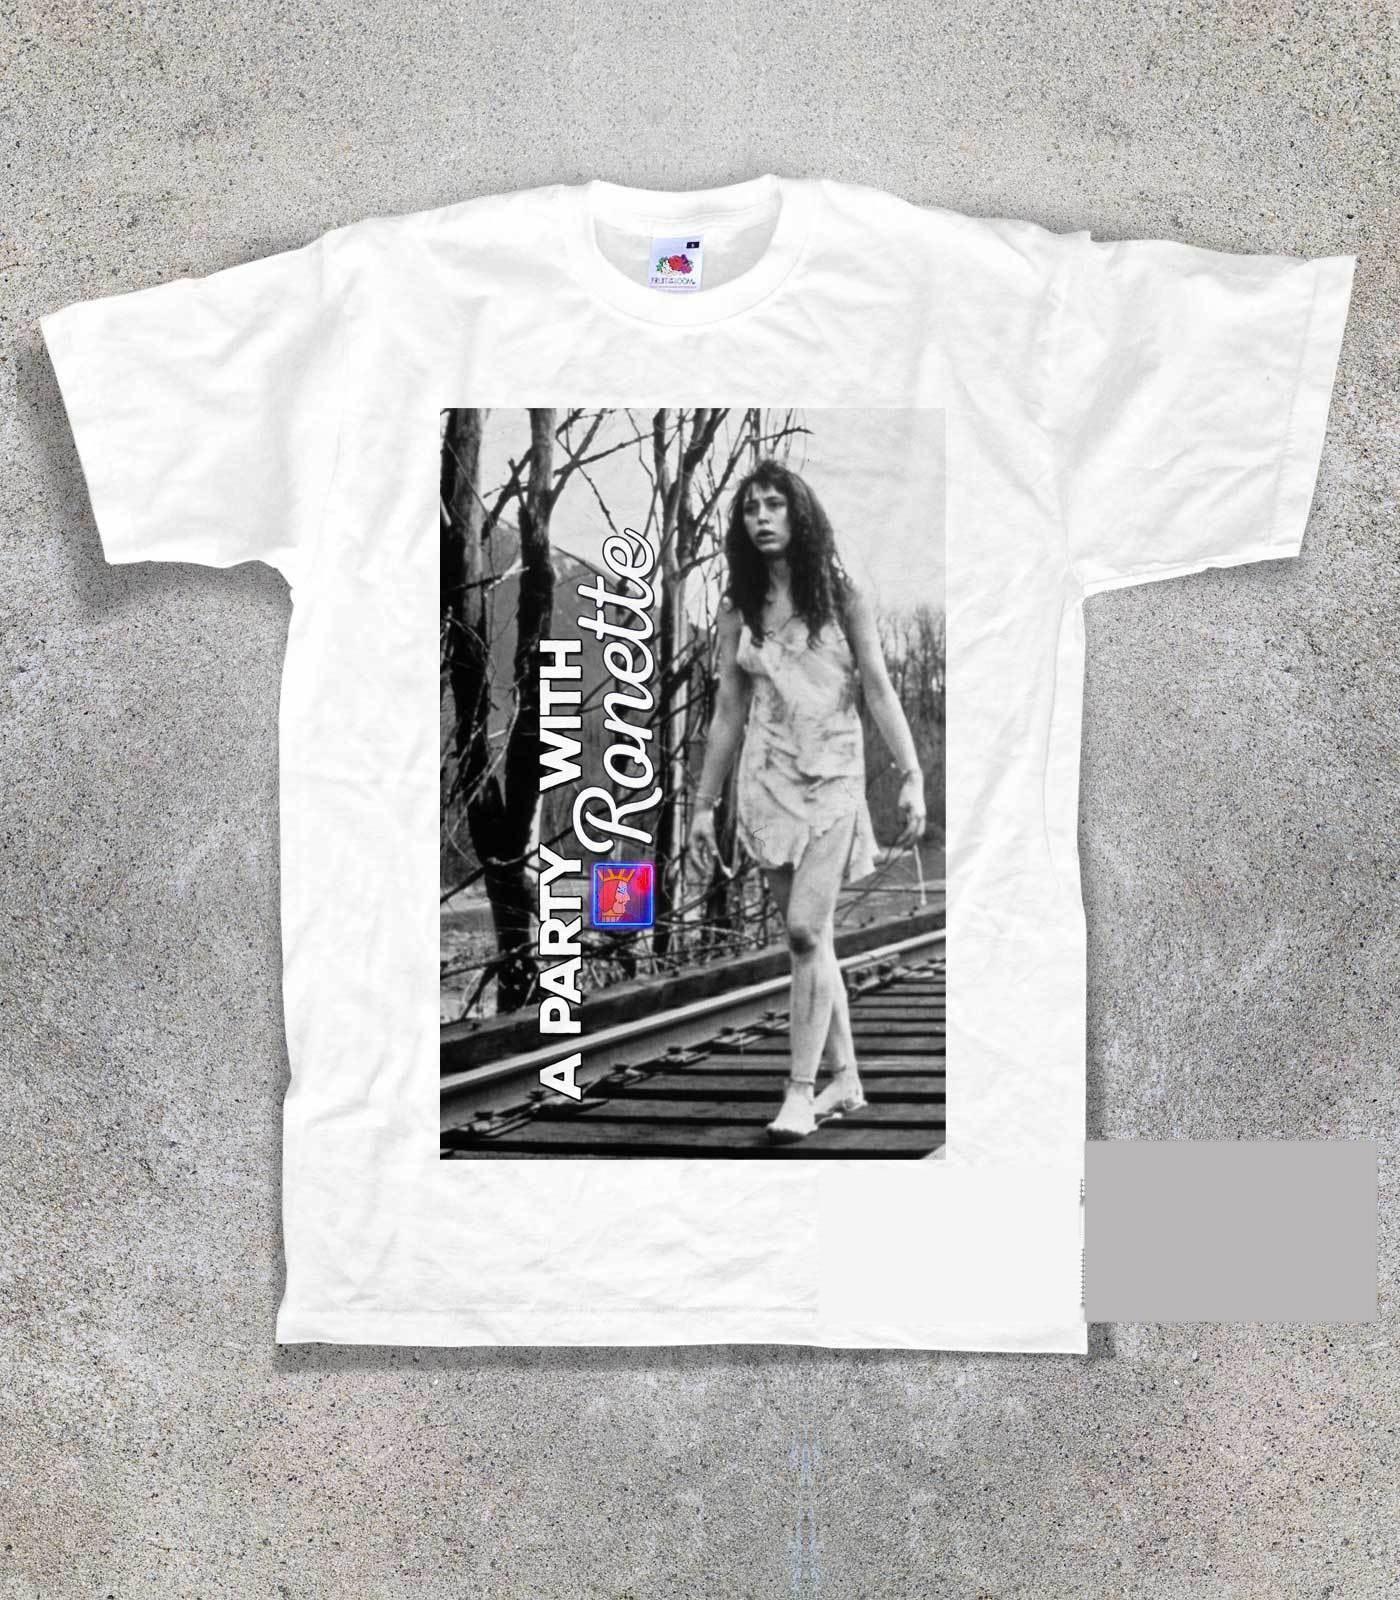 Camiseta Uomo TWIN PEAKS para fiesta con Ronette, camiseta Vintage de un solo ojo con Jack vikinga, camiseta de manga corta para hombre